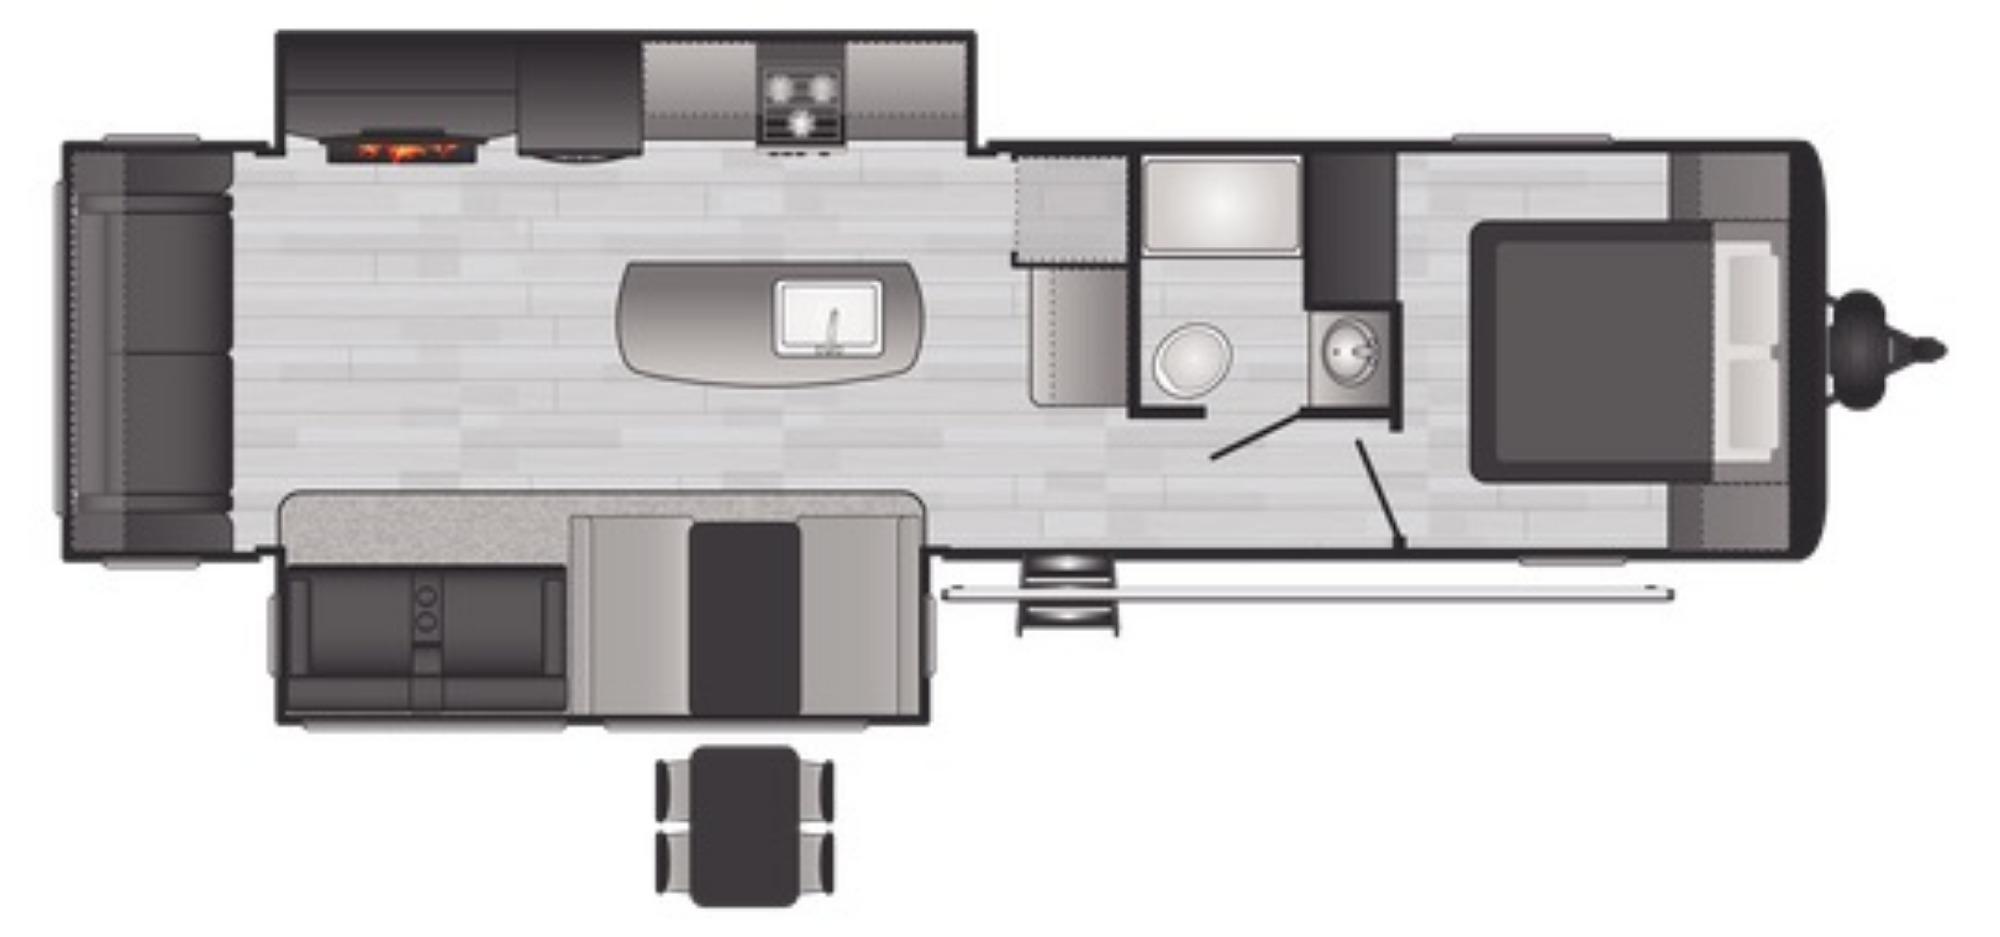 View Floor Plan for 2021 KEYSTONE HIDEOUT 30RLDS